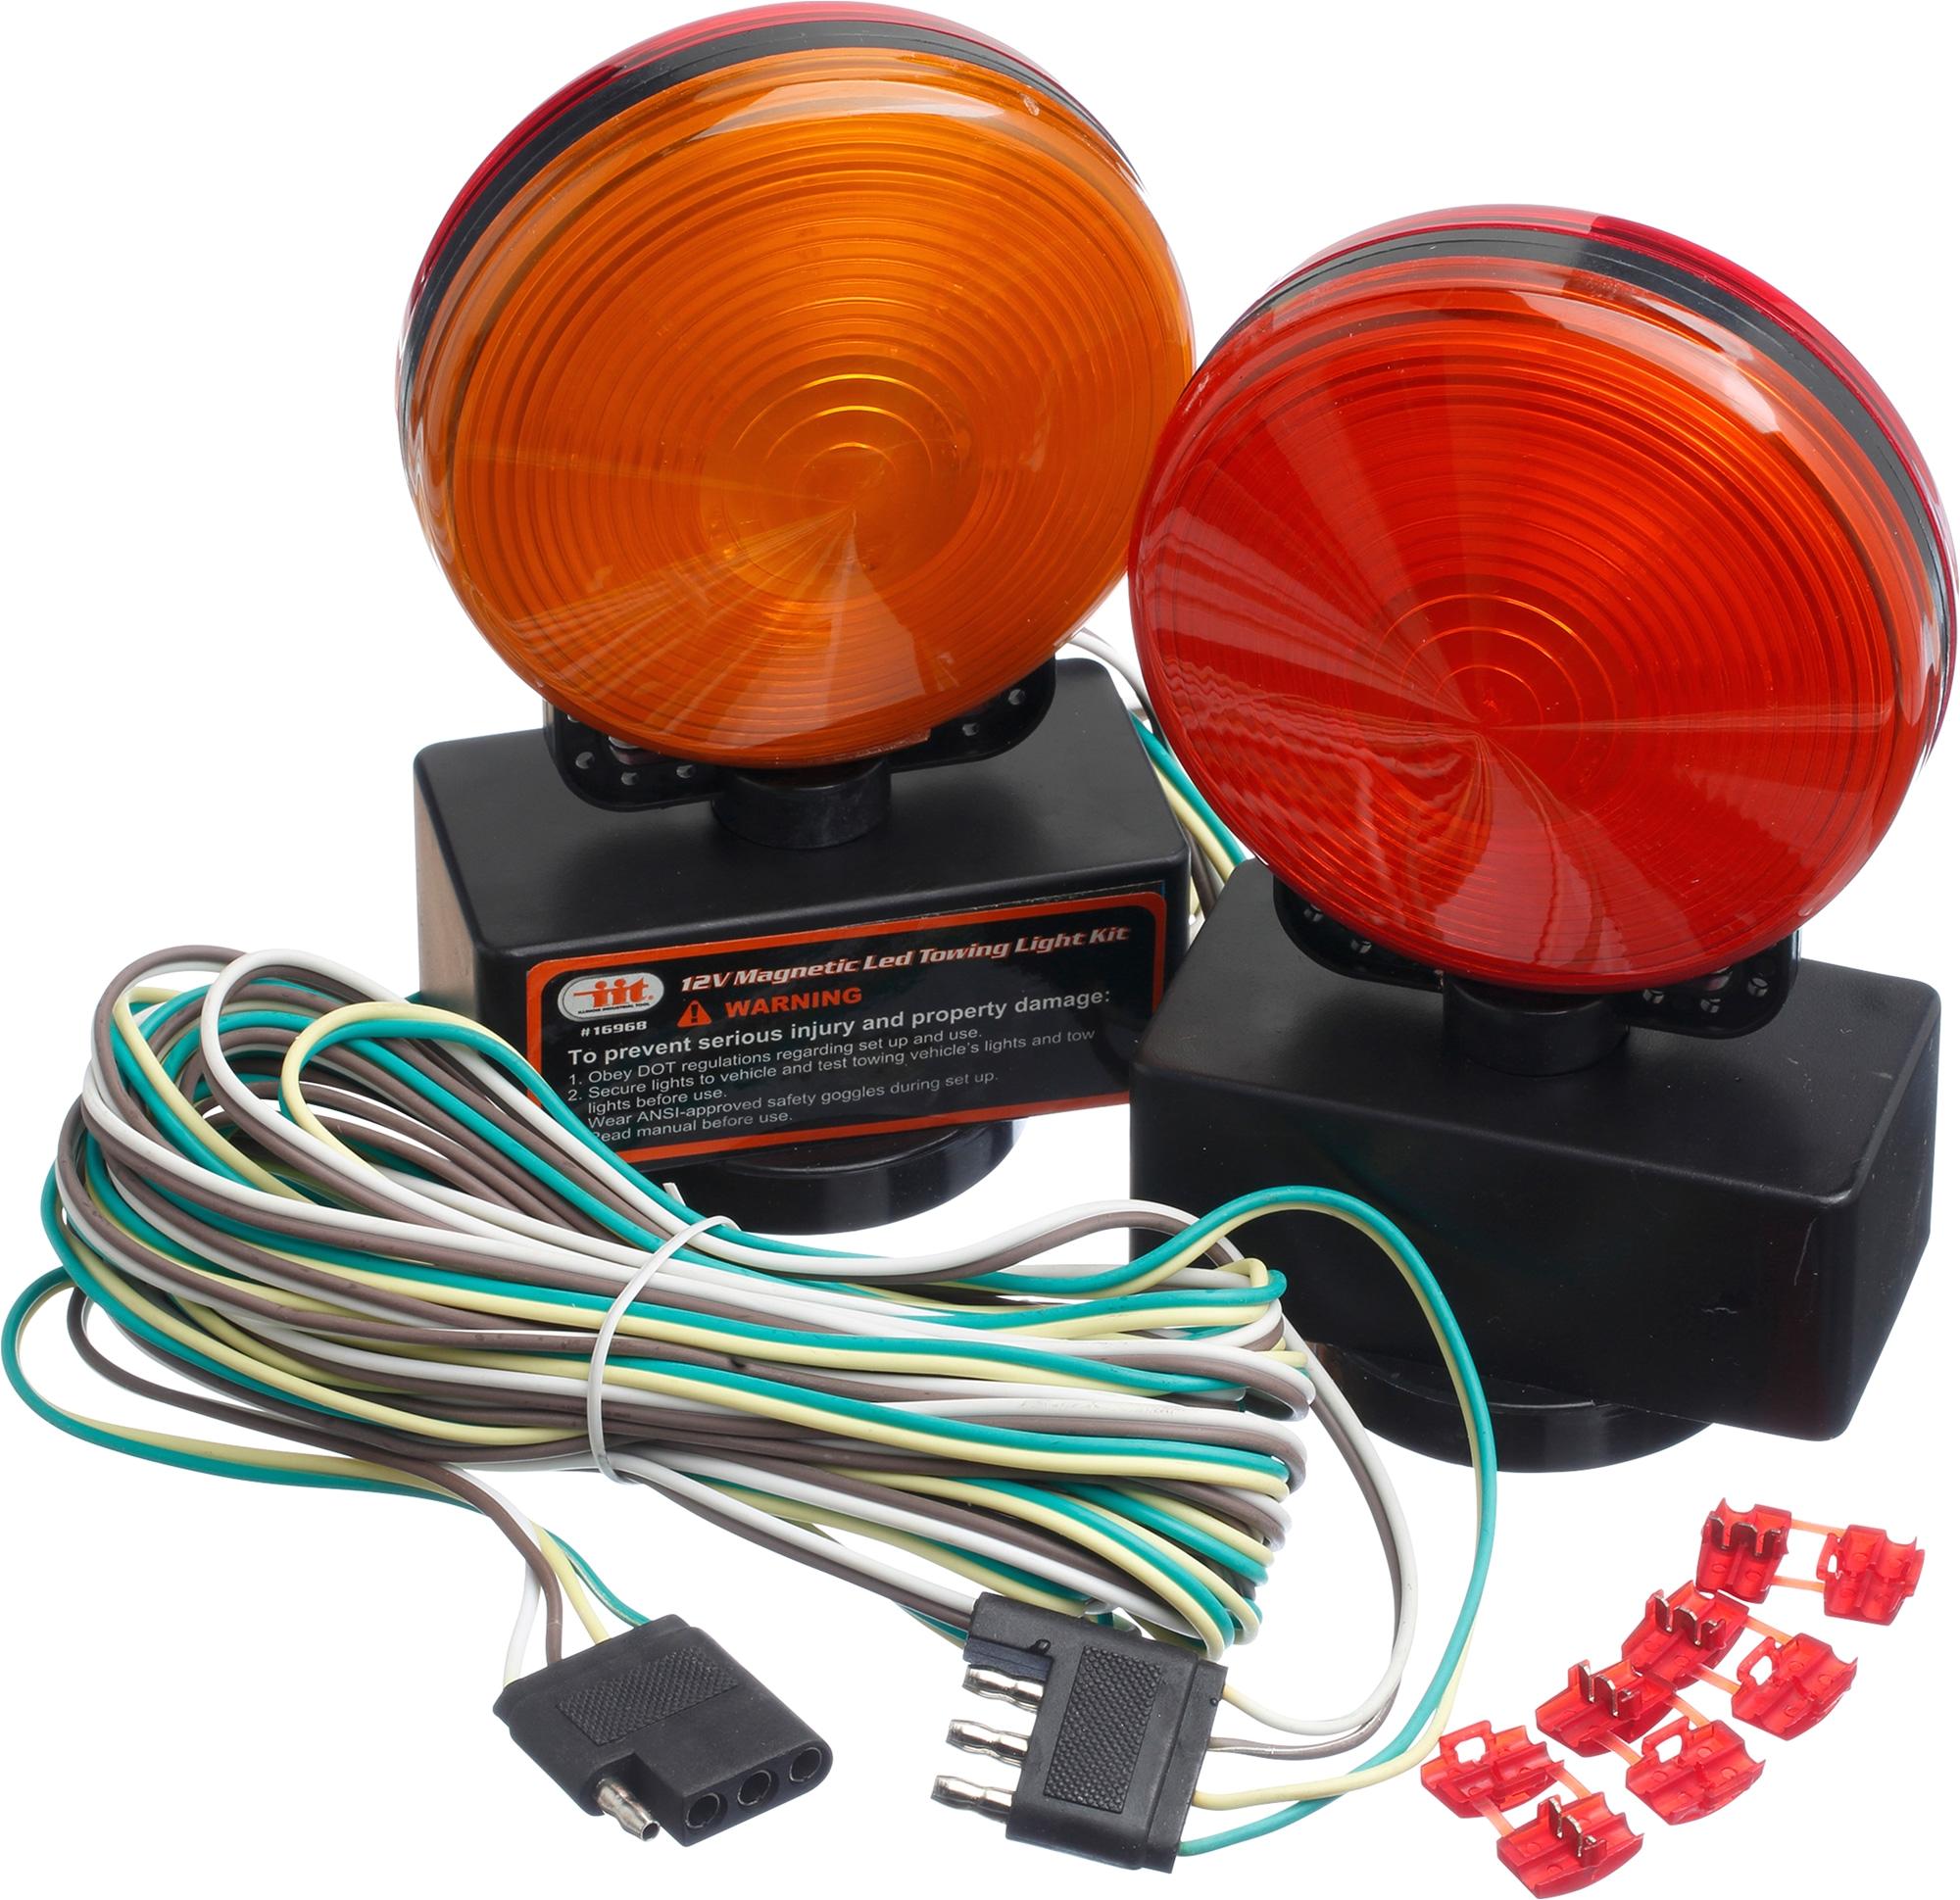 magnetic led towing light kit